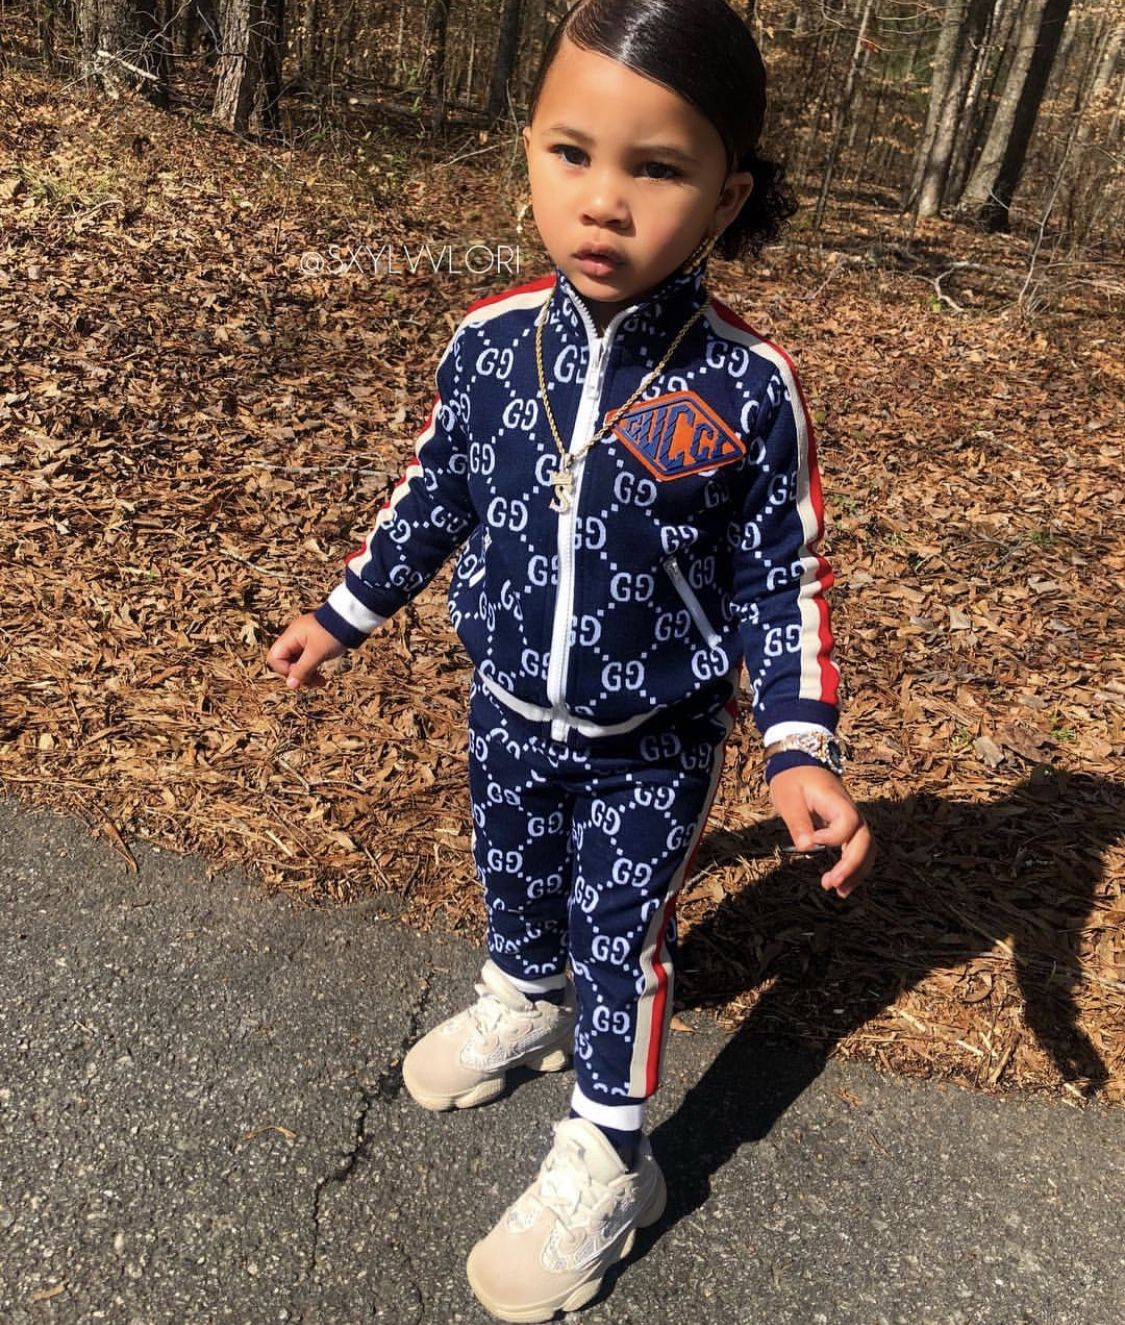 Drippyyy V Cute Black Babies Cute Little Girls Outfits Kids